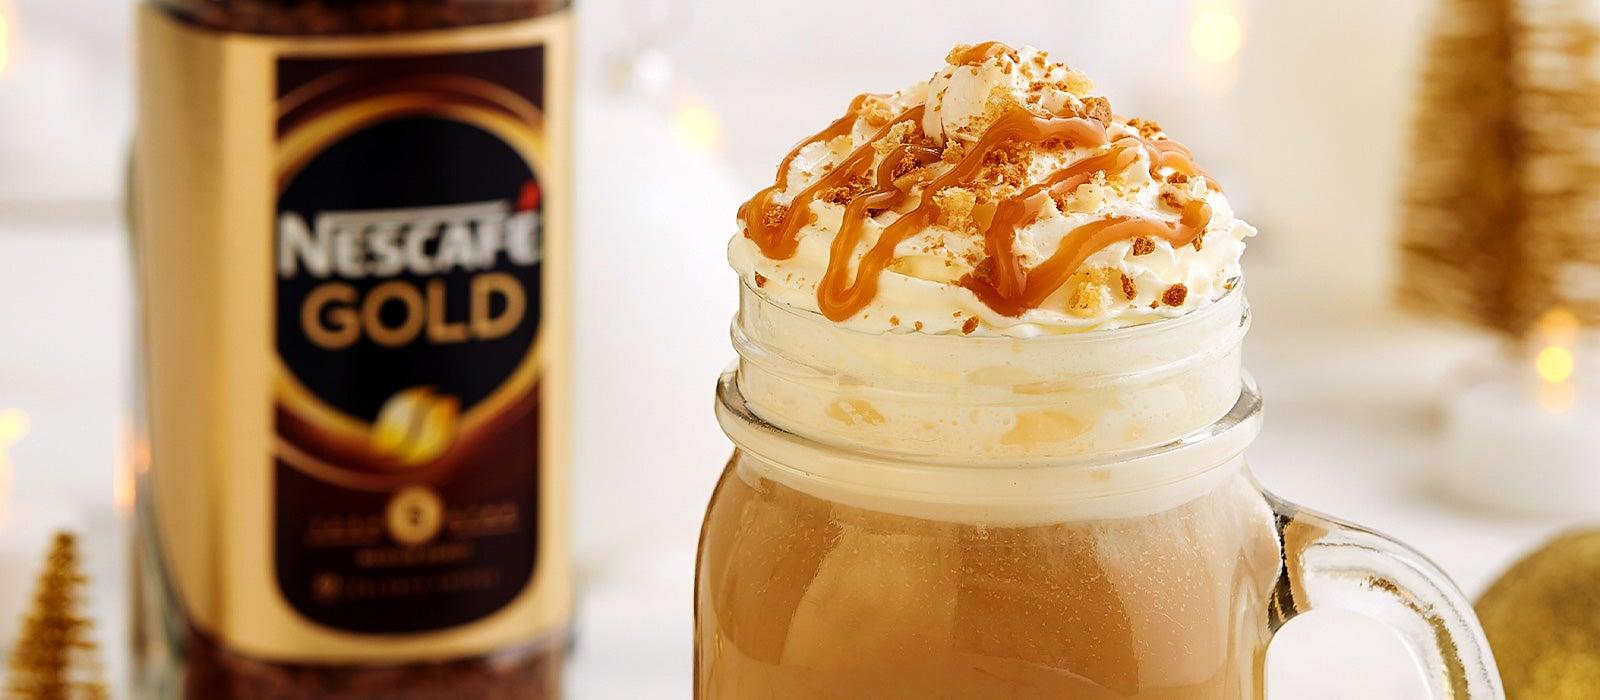 Toffee Nut Latte